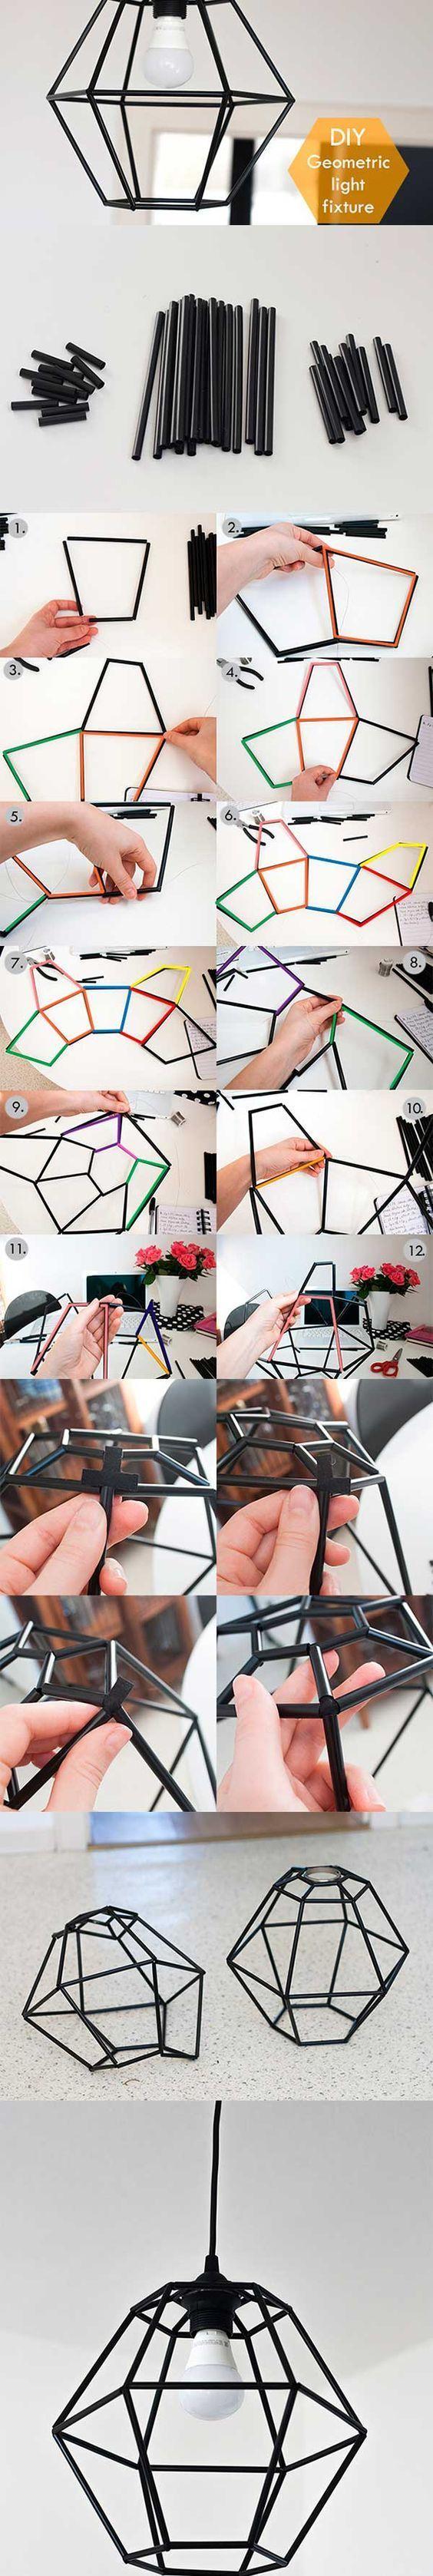 Luminária Geométrica tutorial